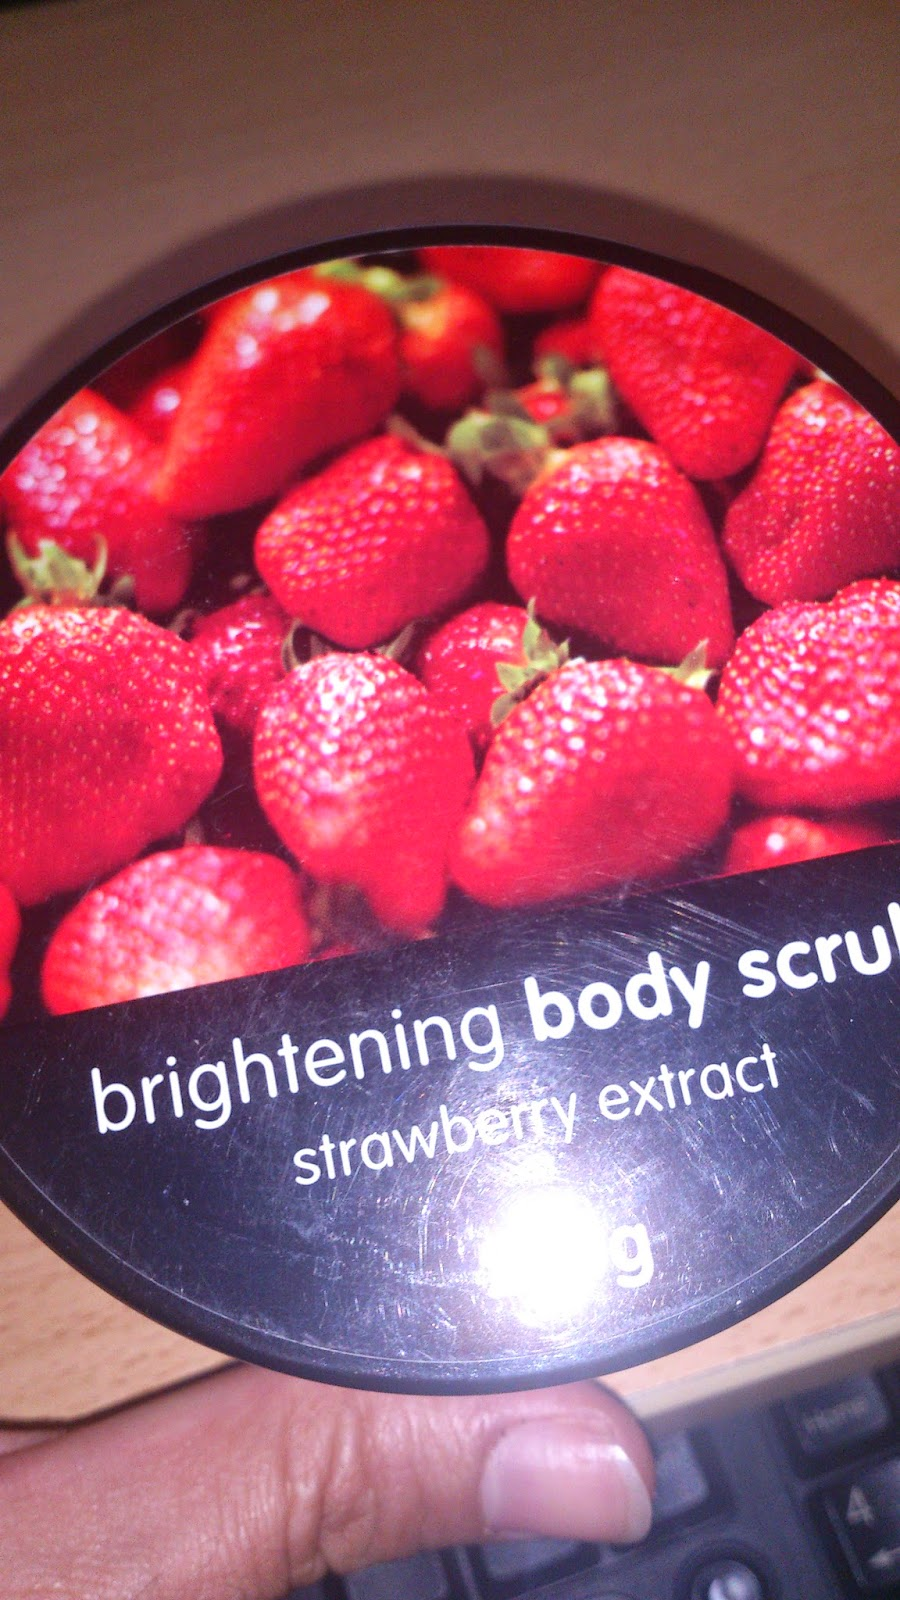 Watsons Brightening Body Scrub - Watsons Çilekli Vücut Peelingi - Watsons Scrub kullananlar - Scrub nasıl kullanılır